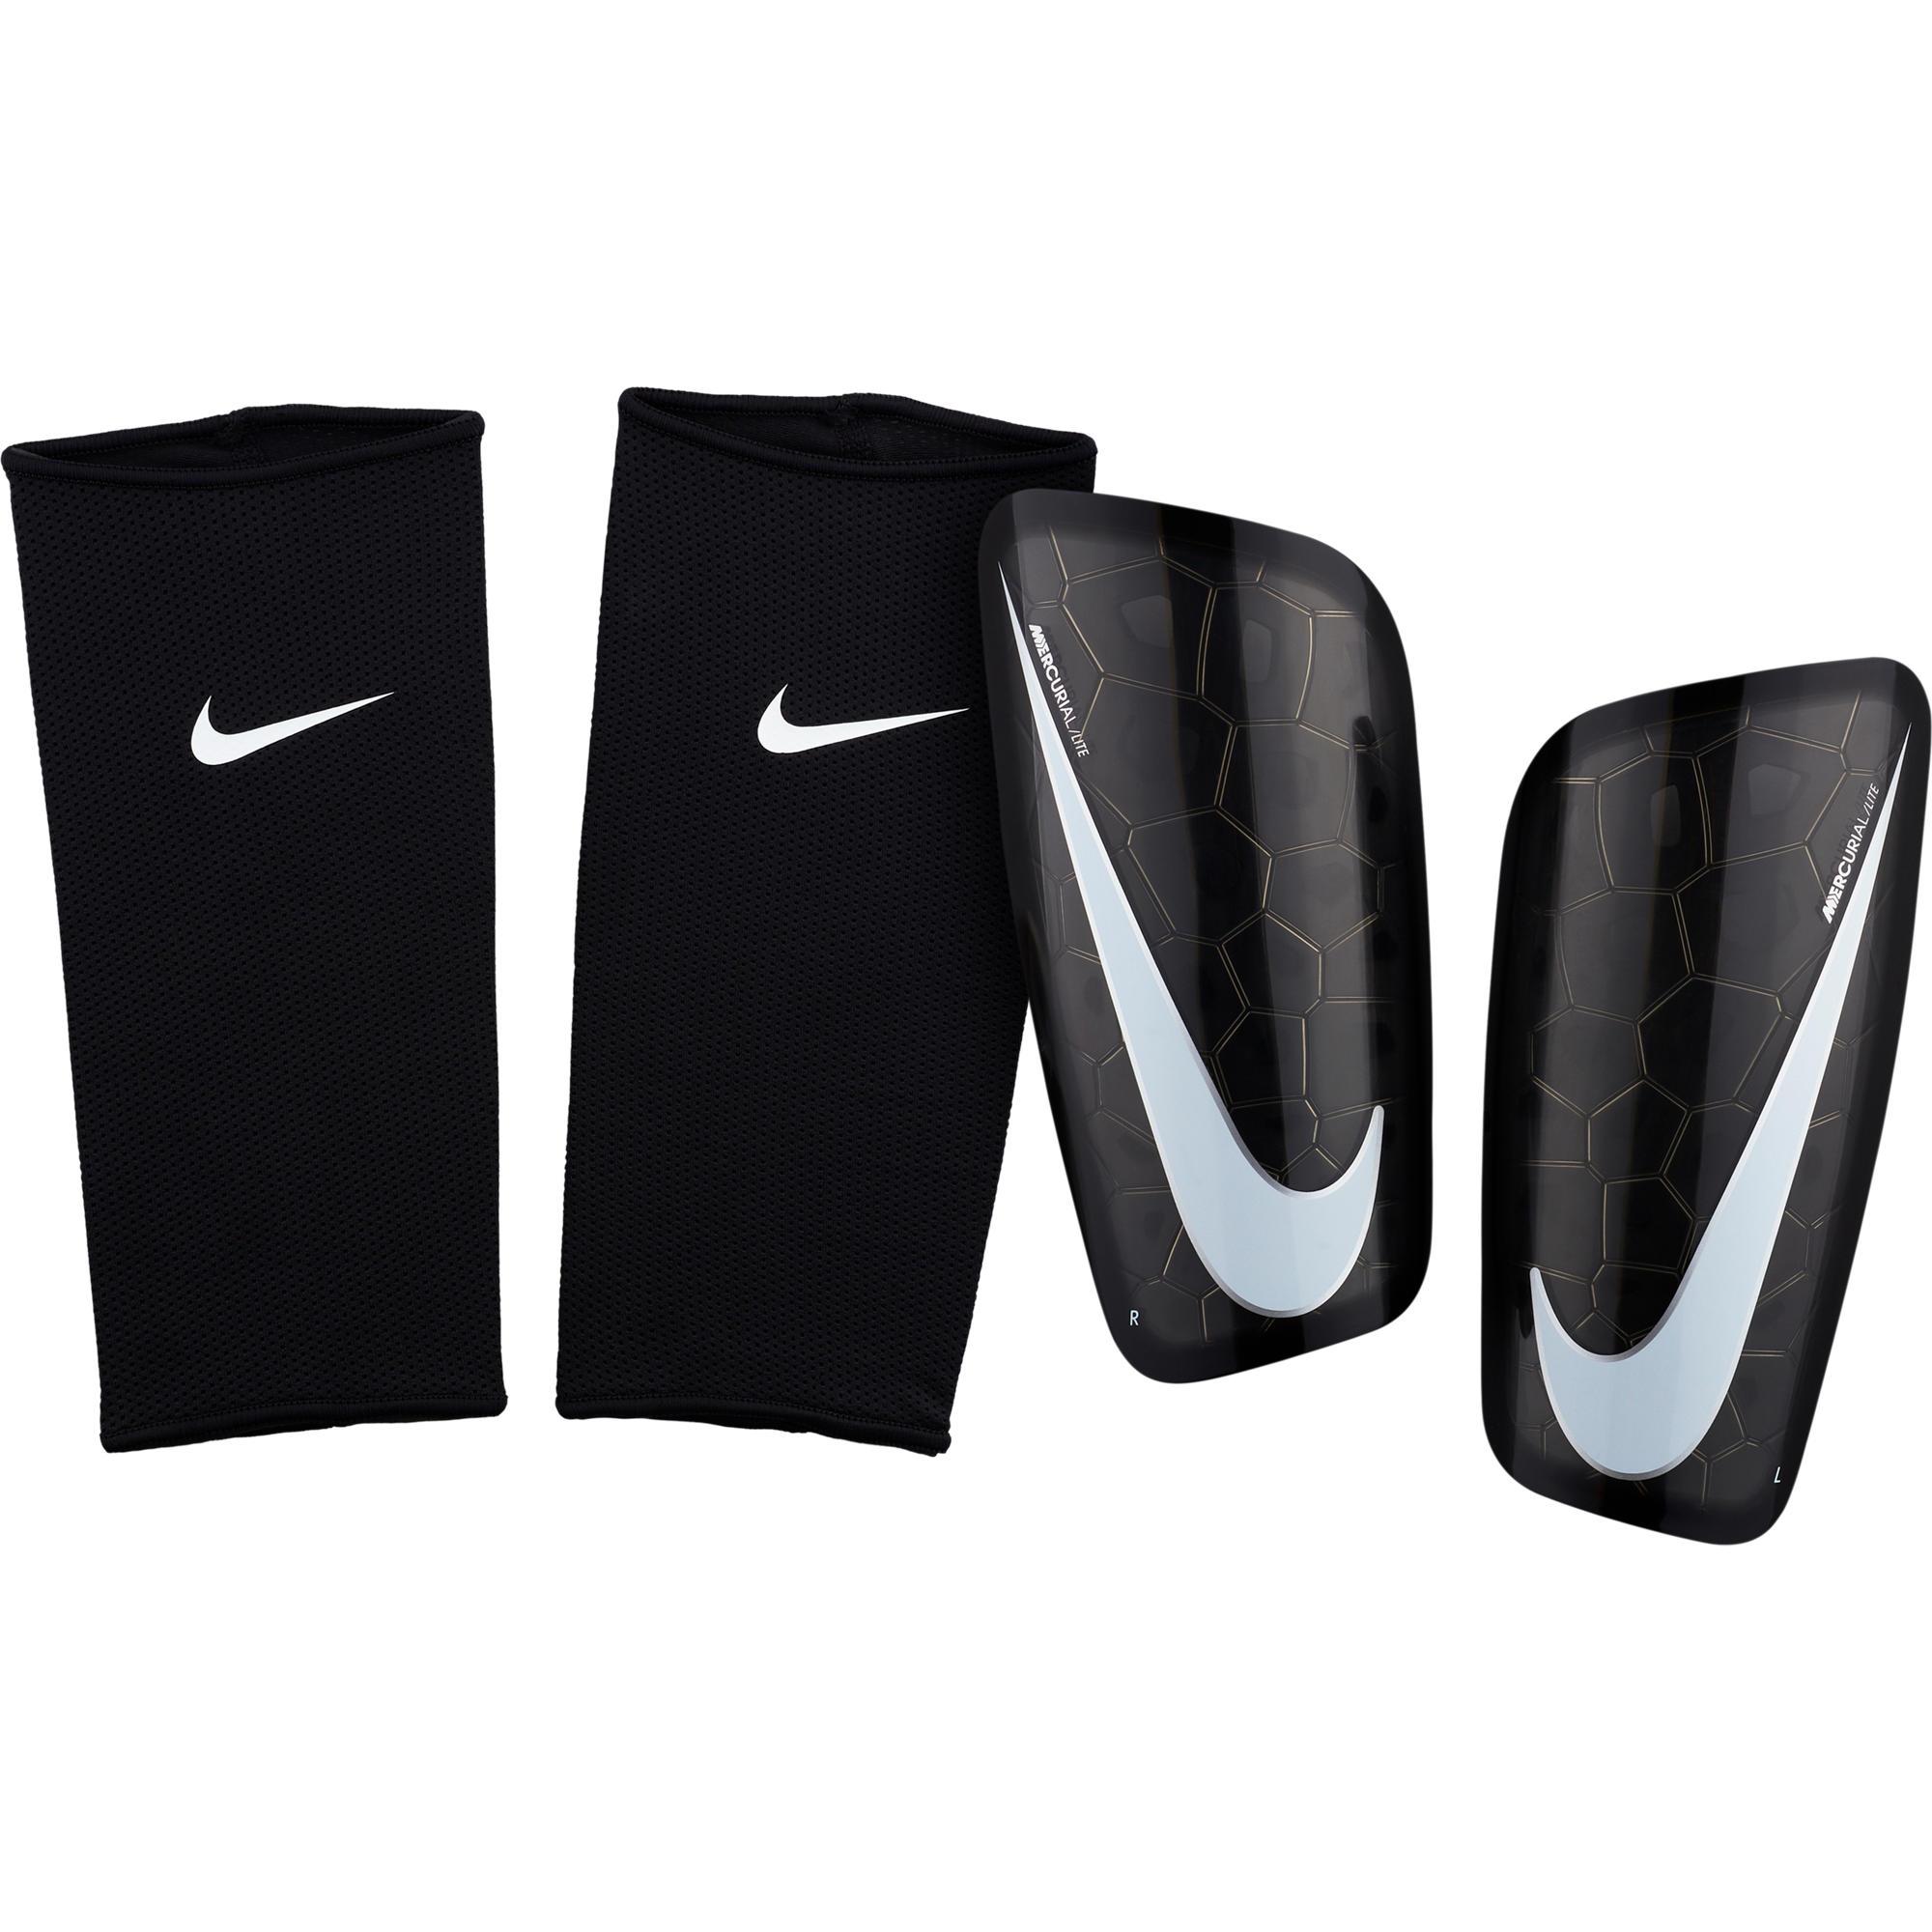 1831eee2a01 Nike Scheenbeschermers voetbal Mercurial Lite zwart | Decathlon.nl